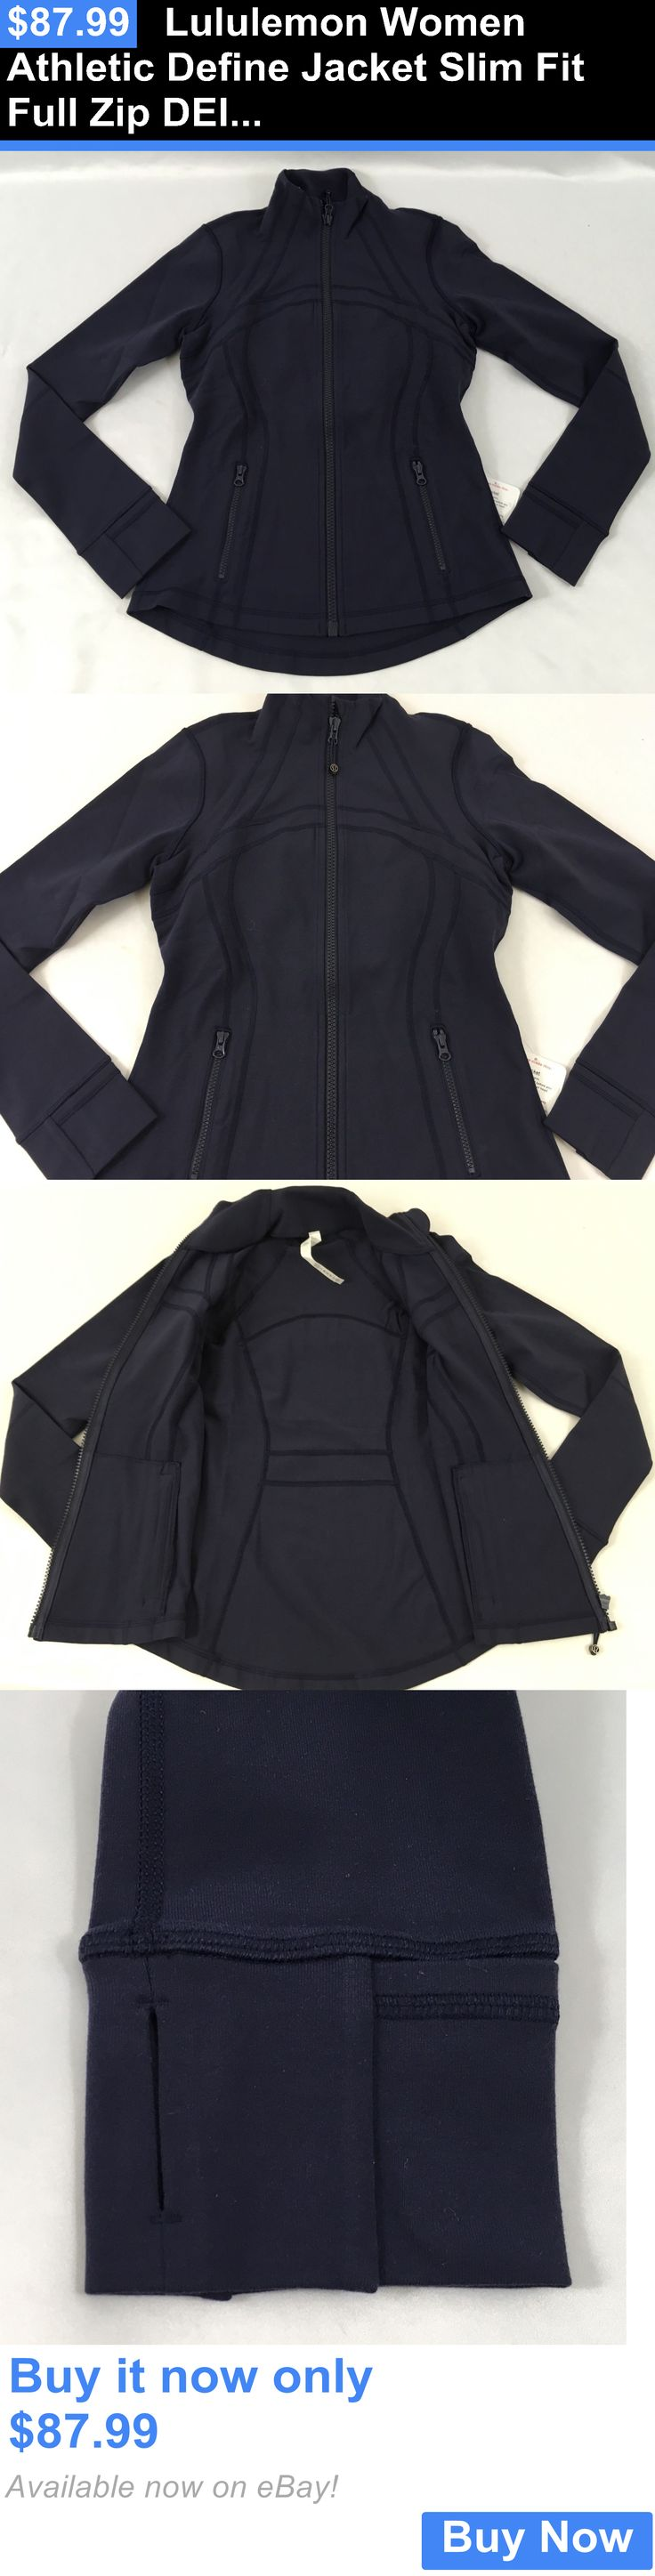 Women Athletics: Lululemon Women Athletic Define Jacket Slim Fit Full Zip Dein Navy Blue Size 4 BUY IT NOW ONLY: $87.99